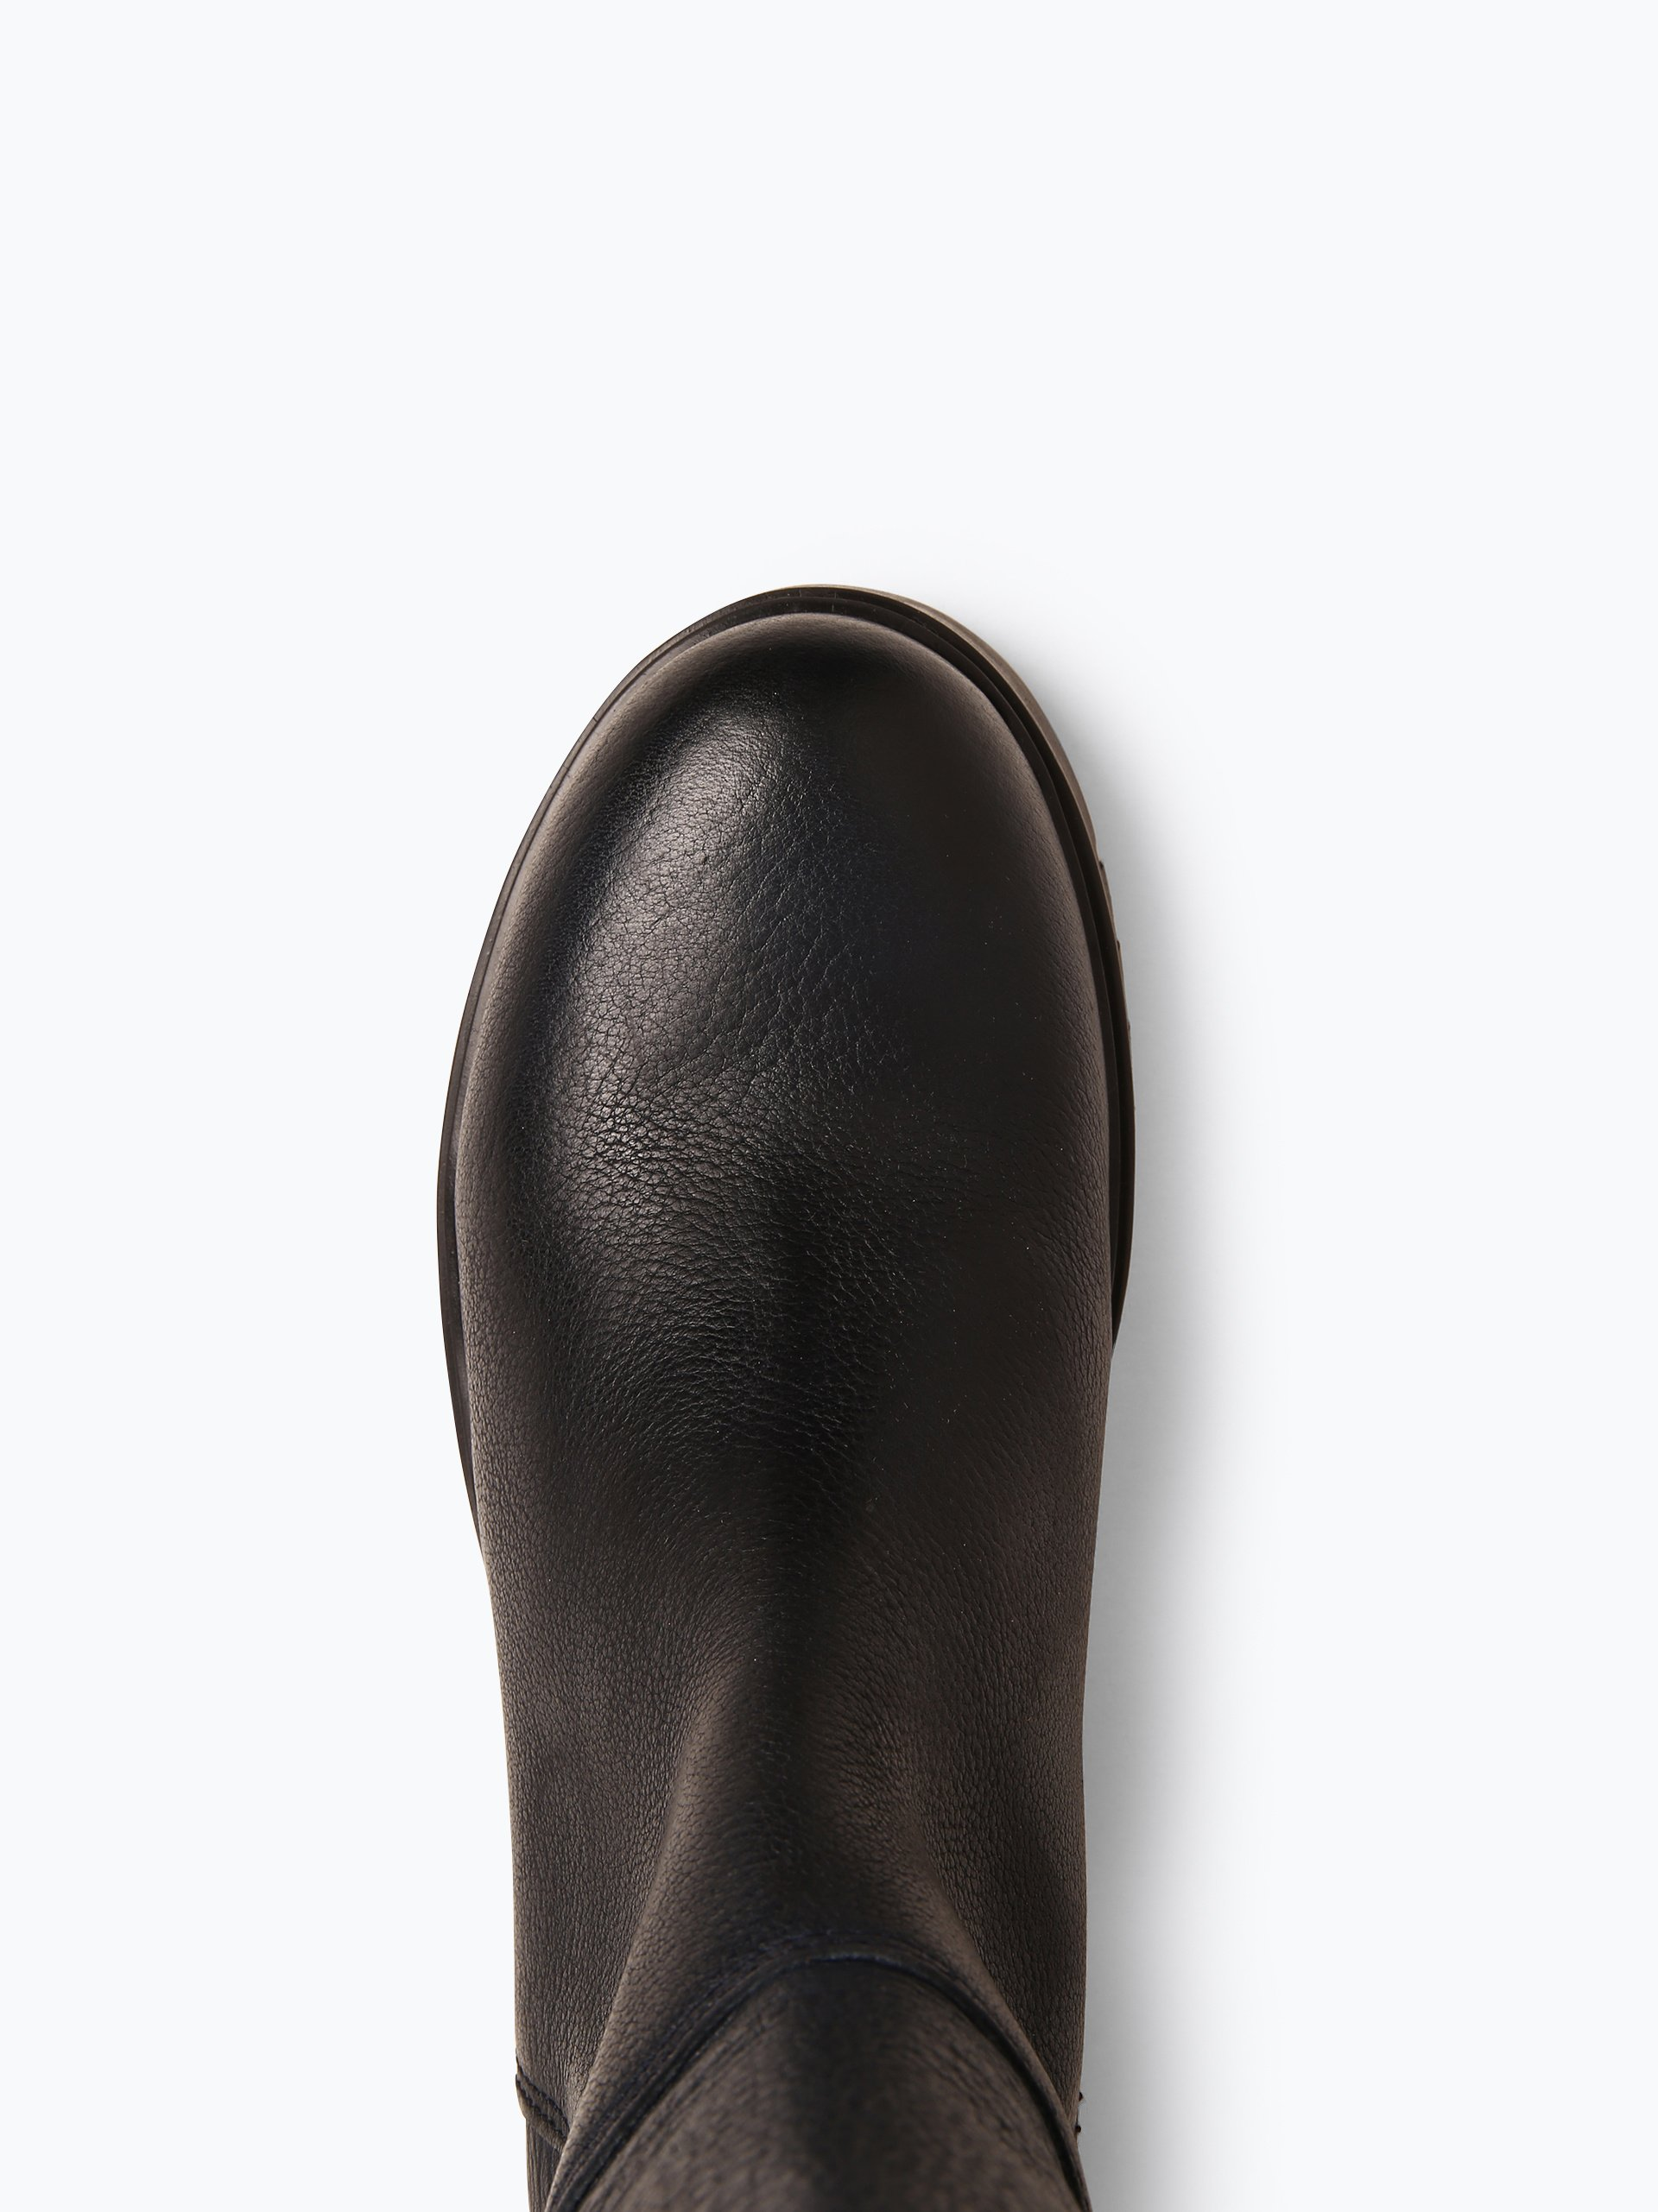 Tommy Jeans Damen Stiefel mit Leder-Anteil